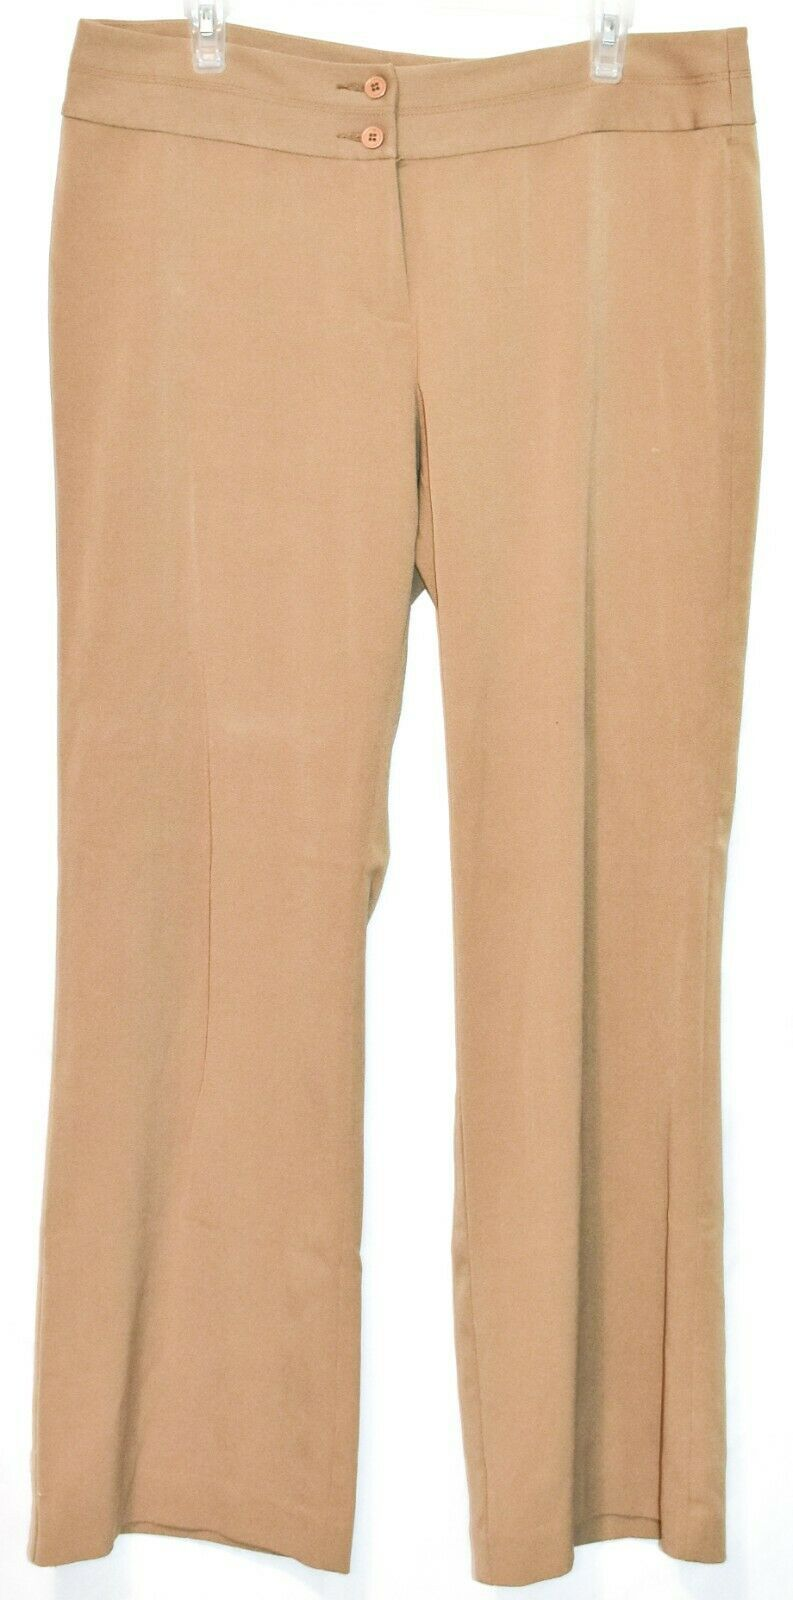 Axcess by Liz Claiborn Women's Tan Khaki Stretch Dress Pants Slacks Size 14